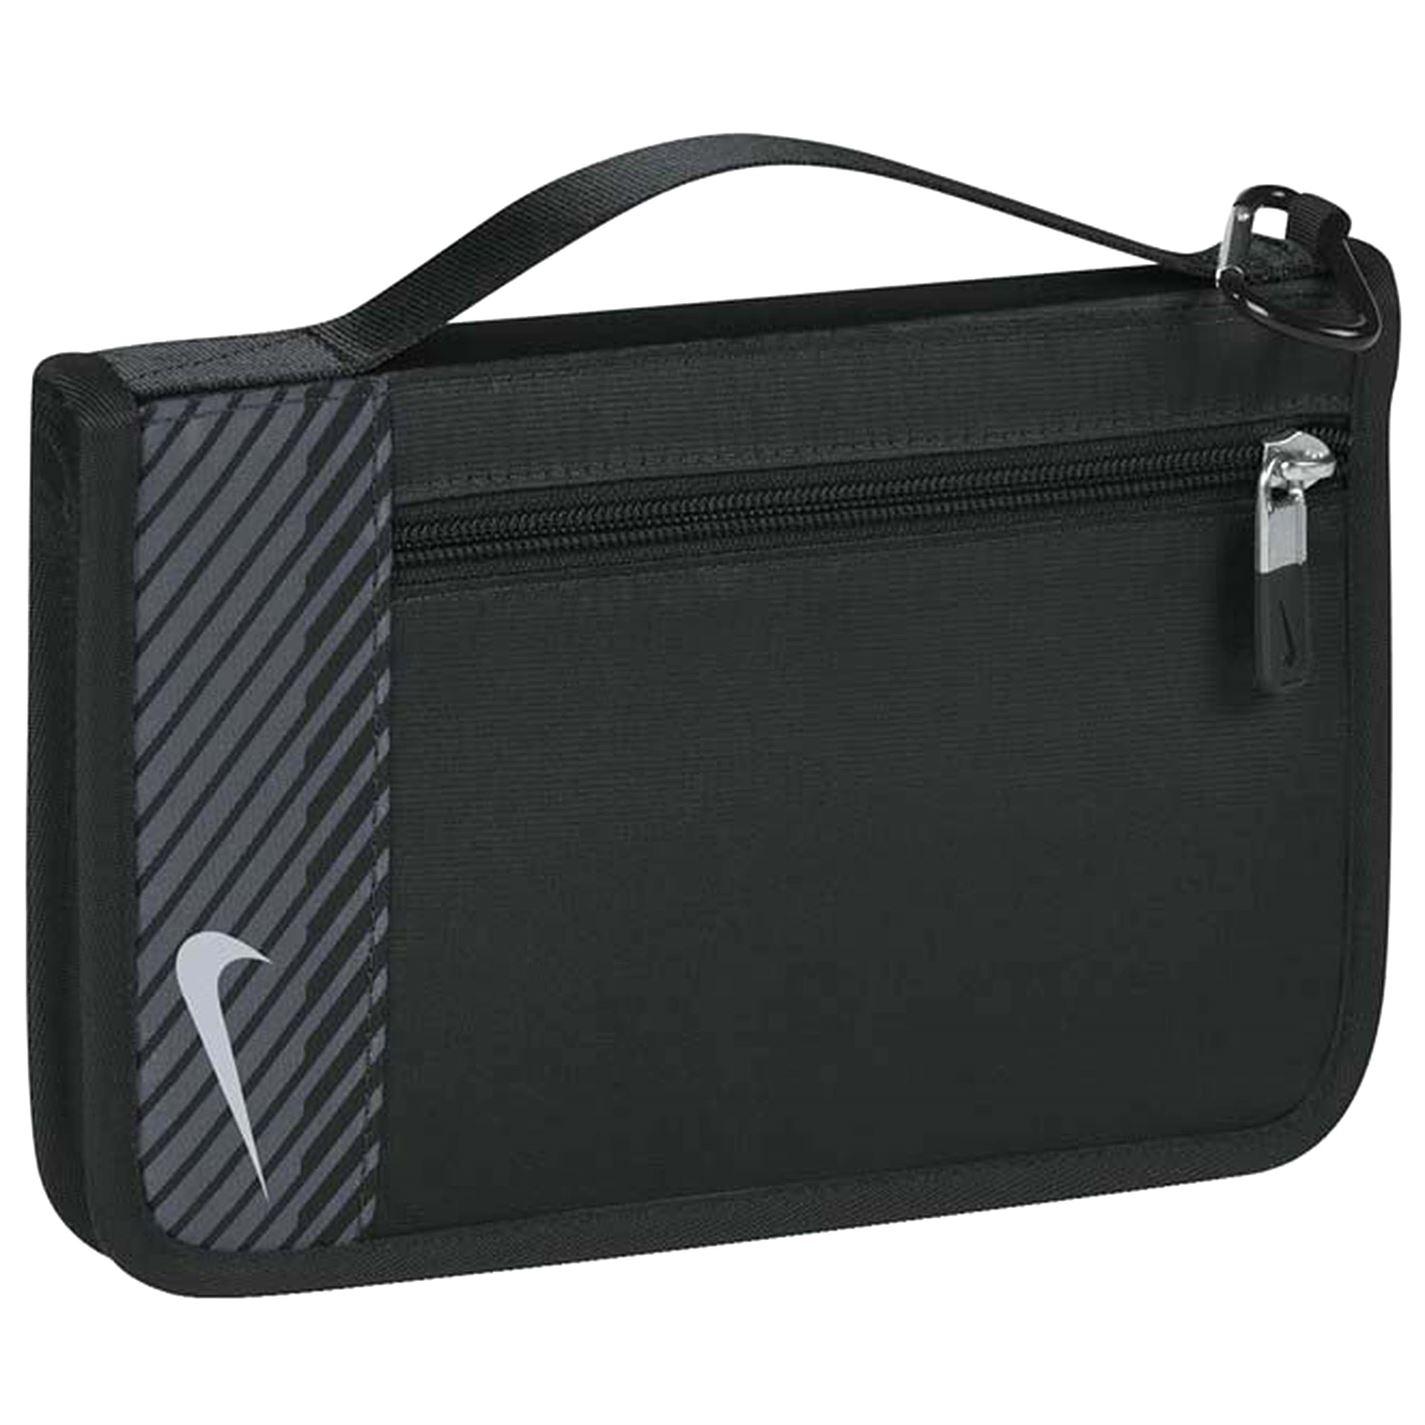 Nike Sport Organizer